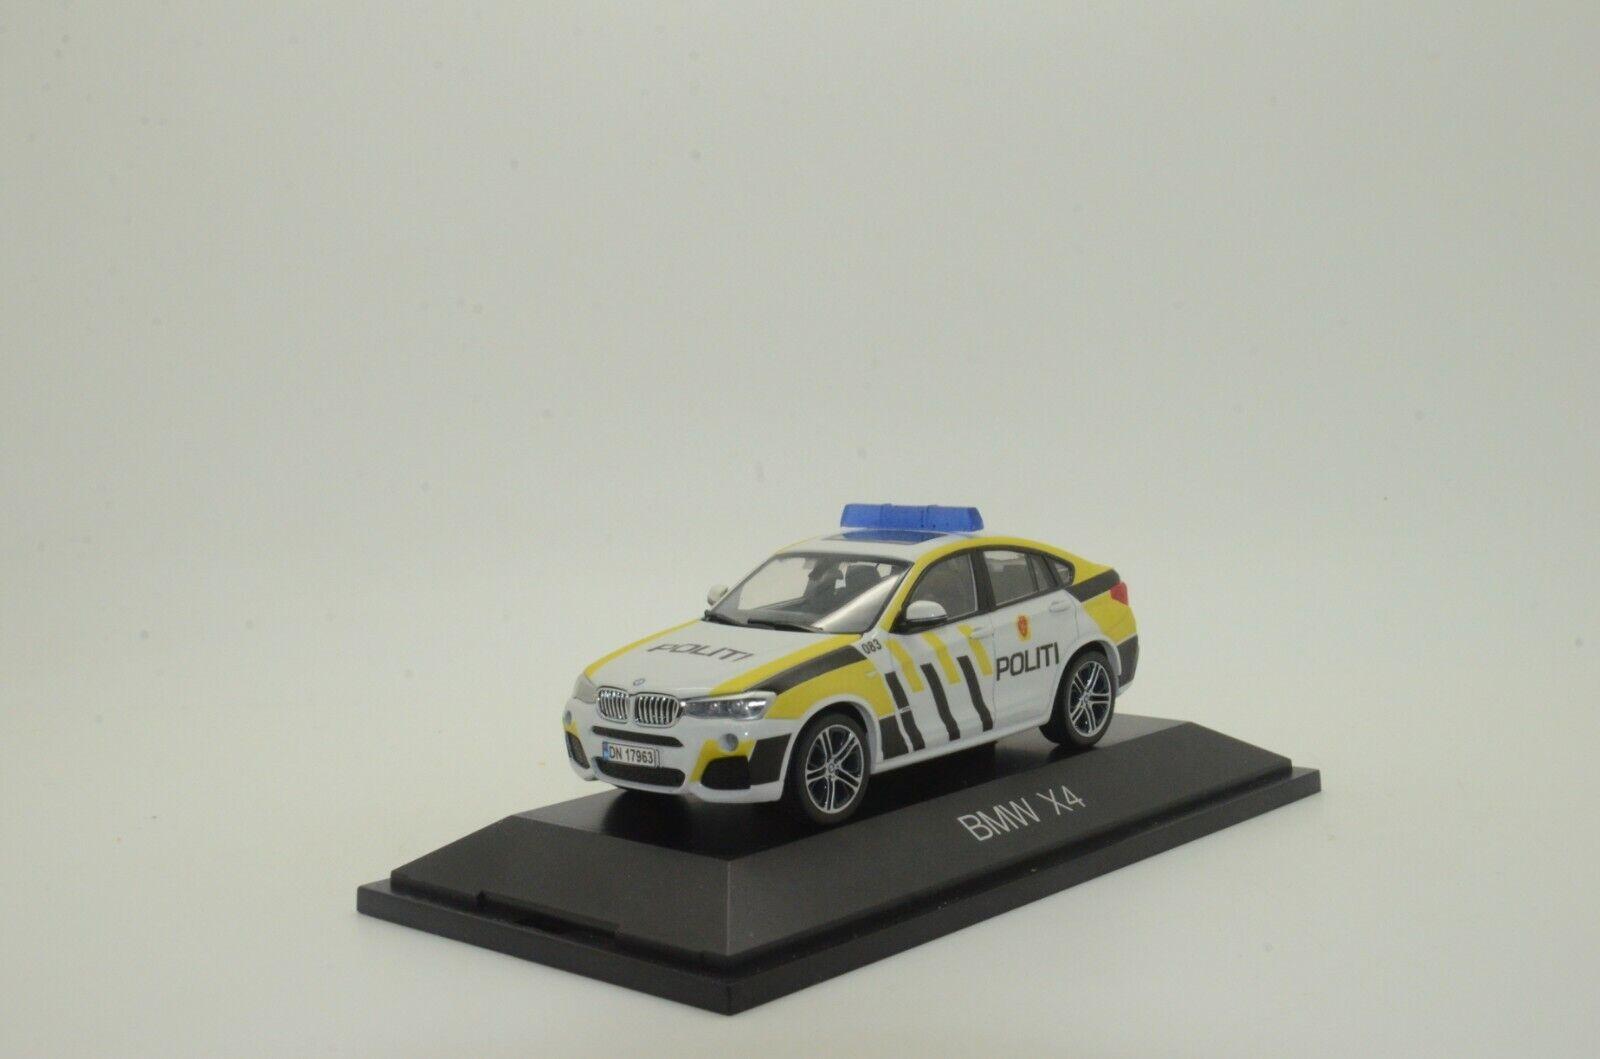 Raro  BMW X4 Noruega Koek policía Hecho a Medida 1 43